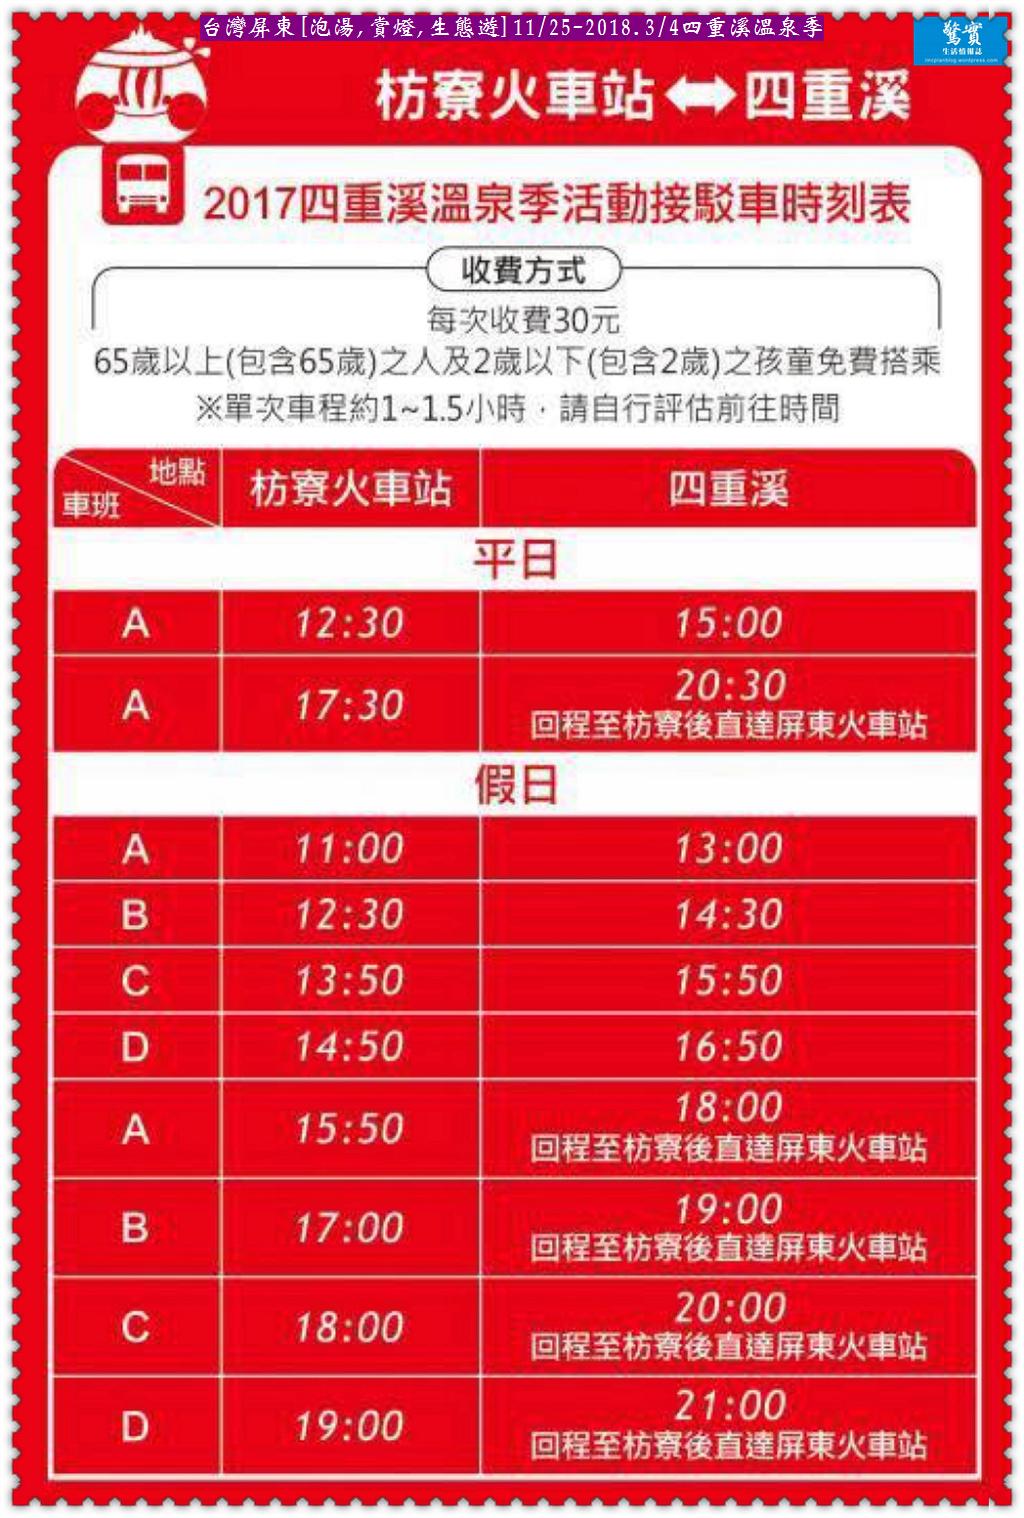 20171126a(驚實)-台灣屏東[泡湯,賞燈,生態遊]1125-20180304四重溪溫泉季05